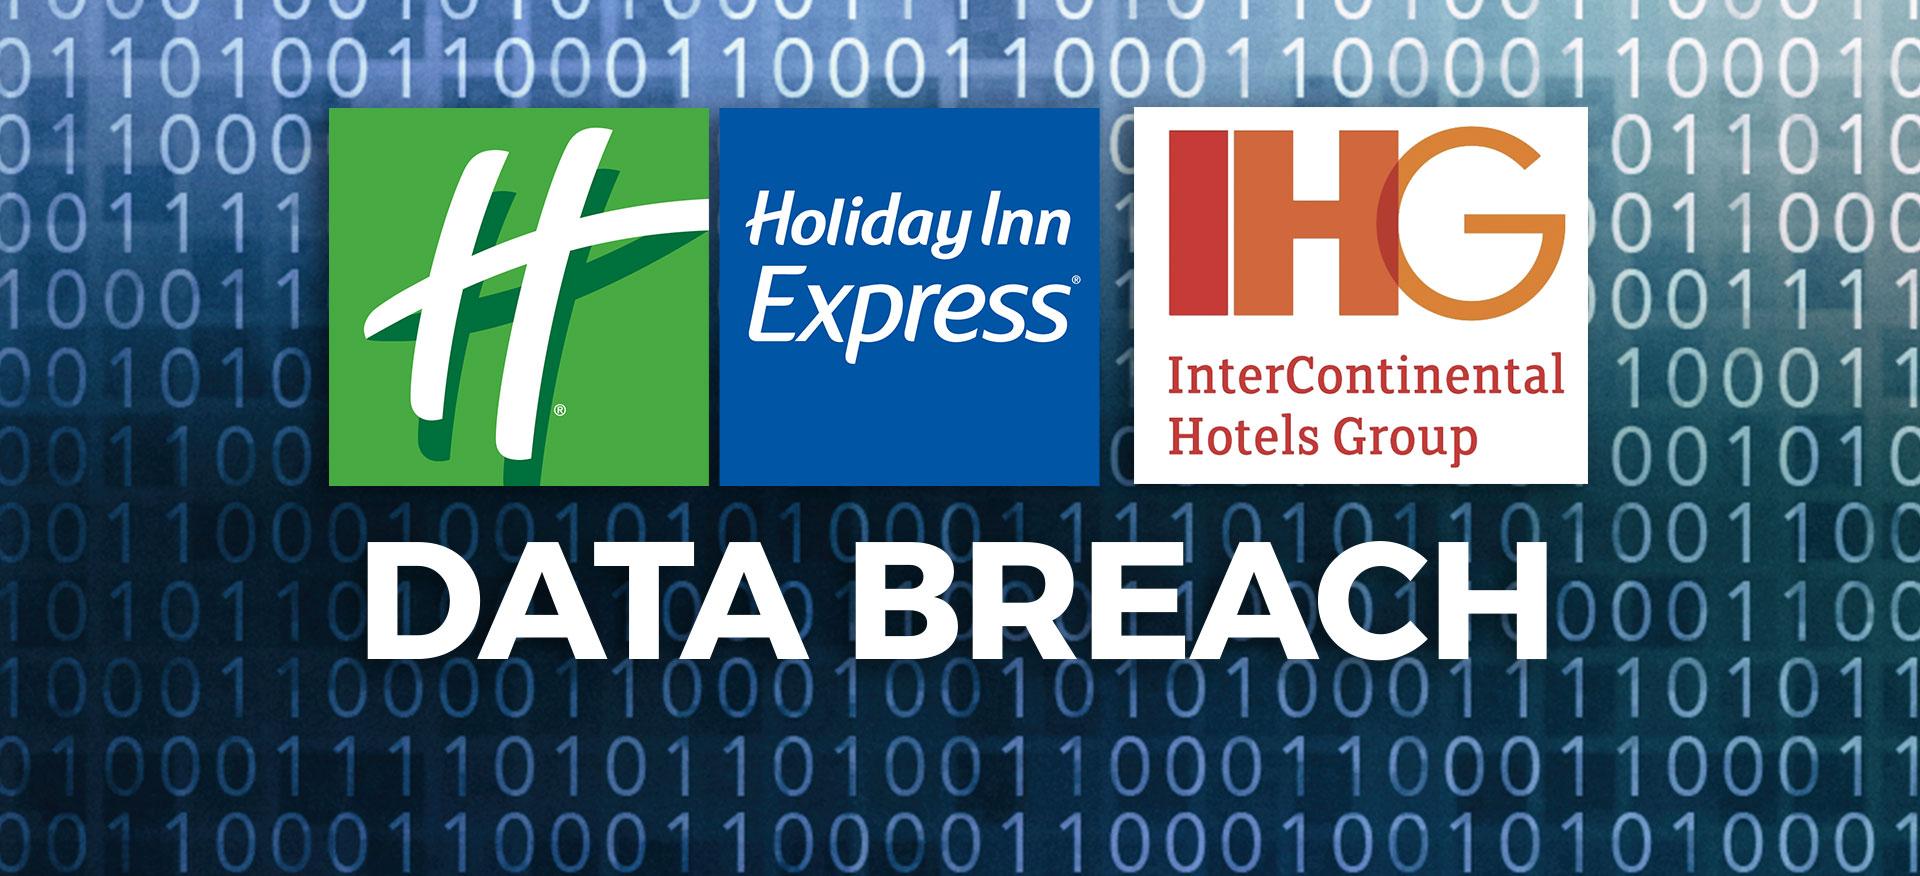 Holiday Inn Express InterContinental Hotels Group IHG Data Breach